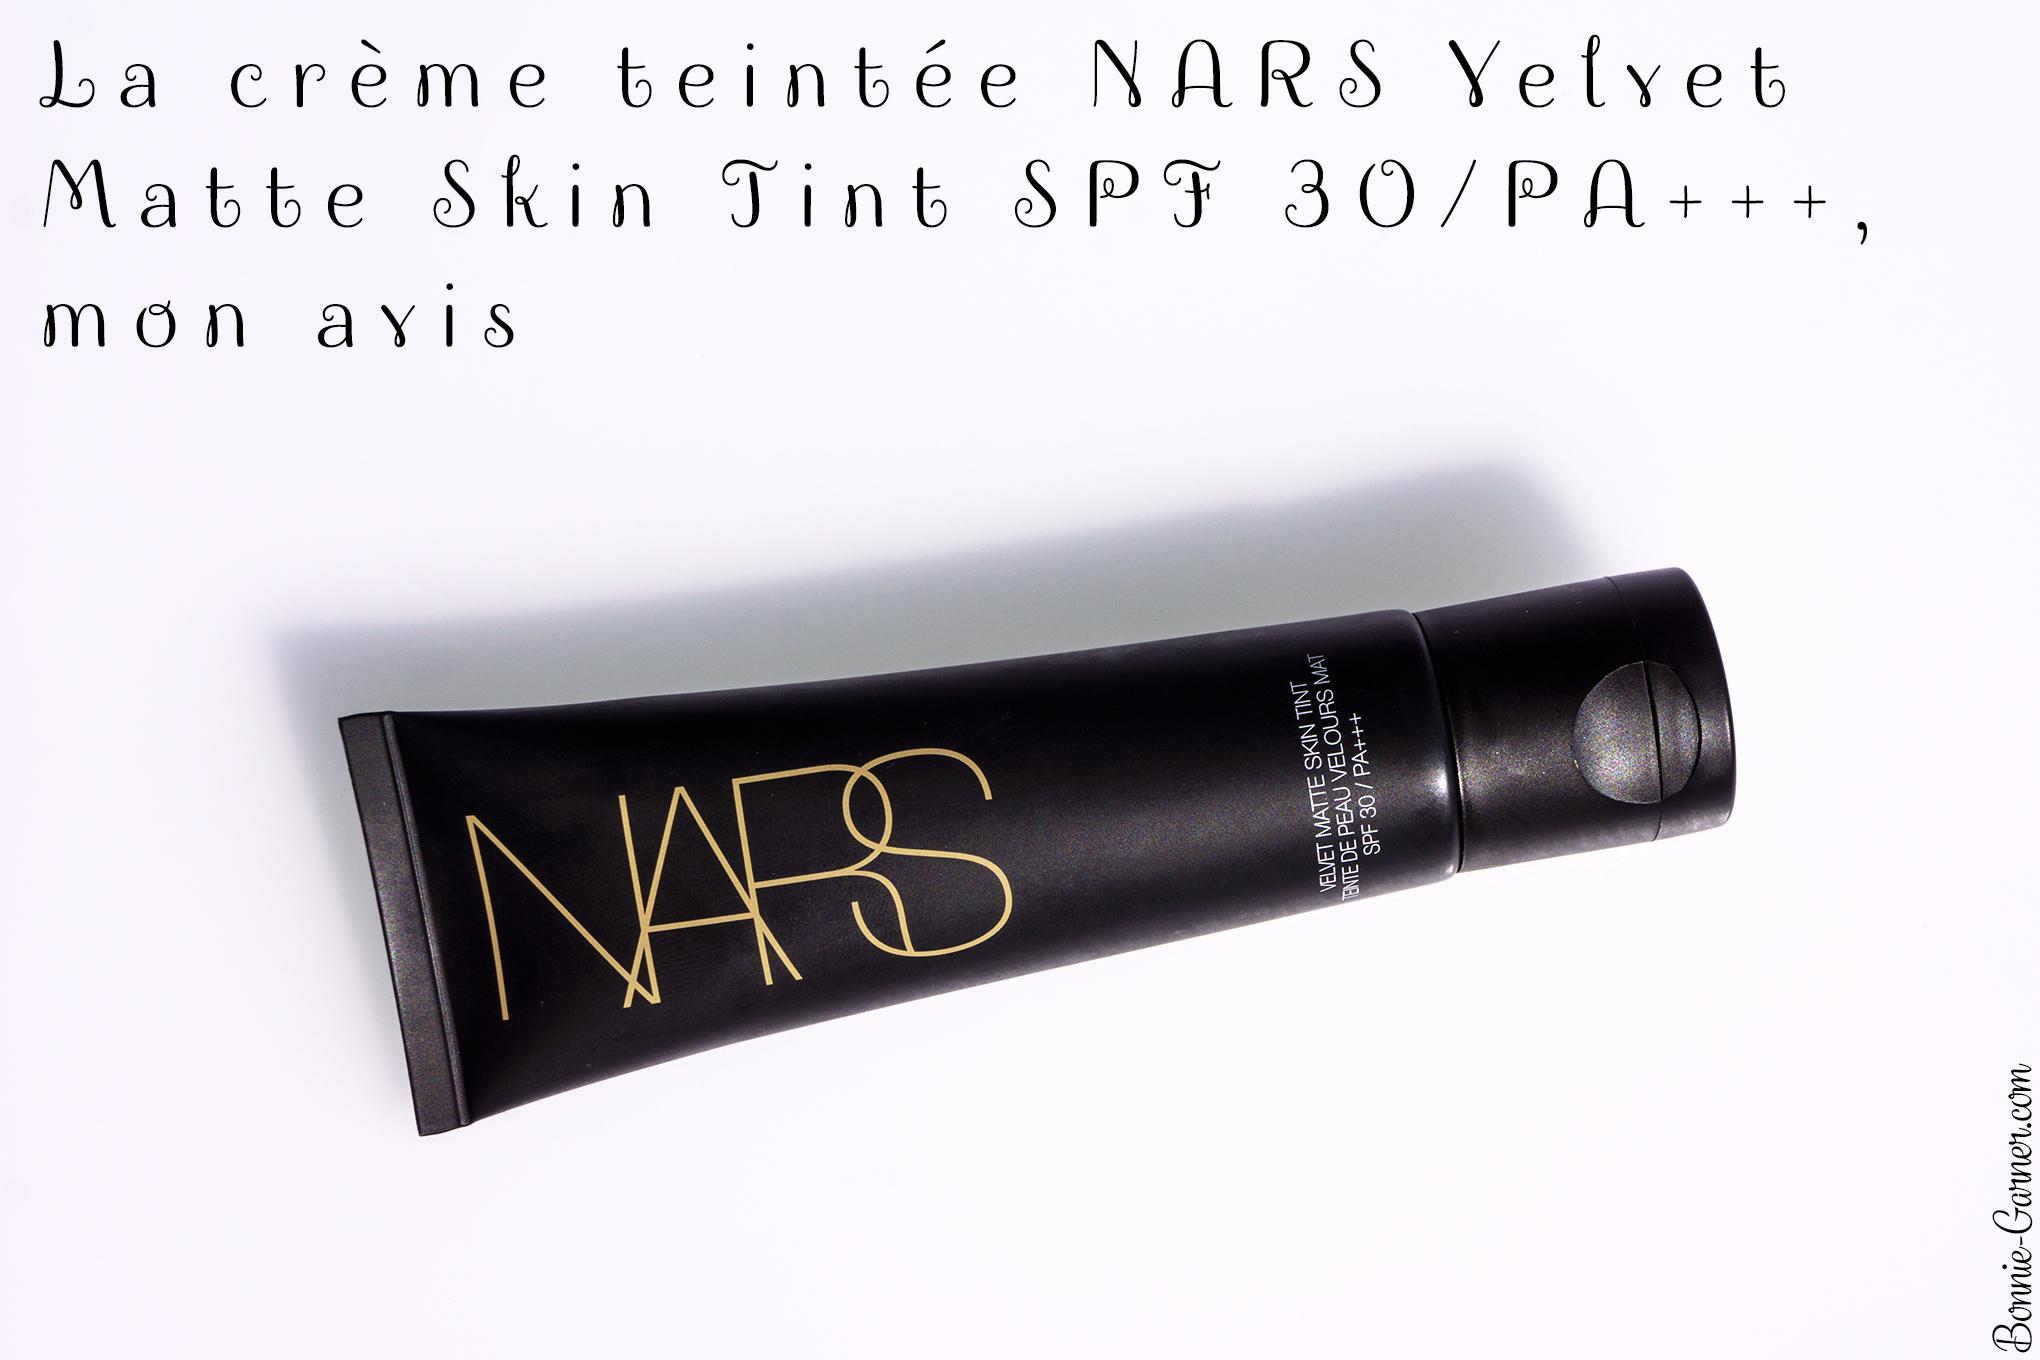 La crème teintée NARS Velvet Matte Skin Tint SPF 30/PA+++, mon avis